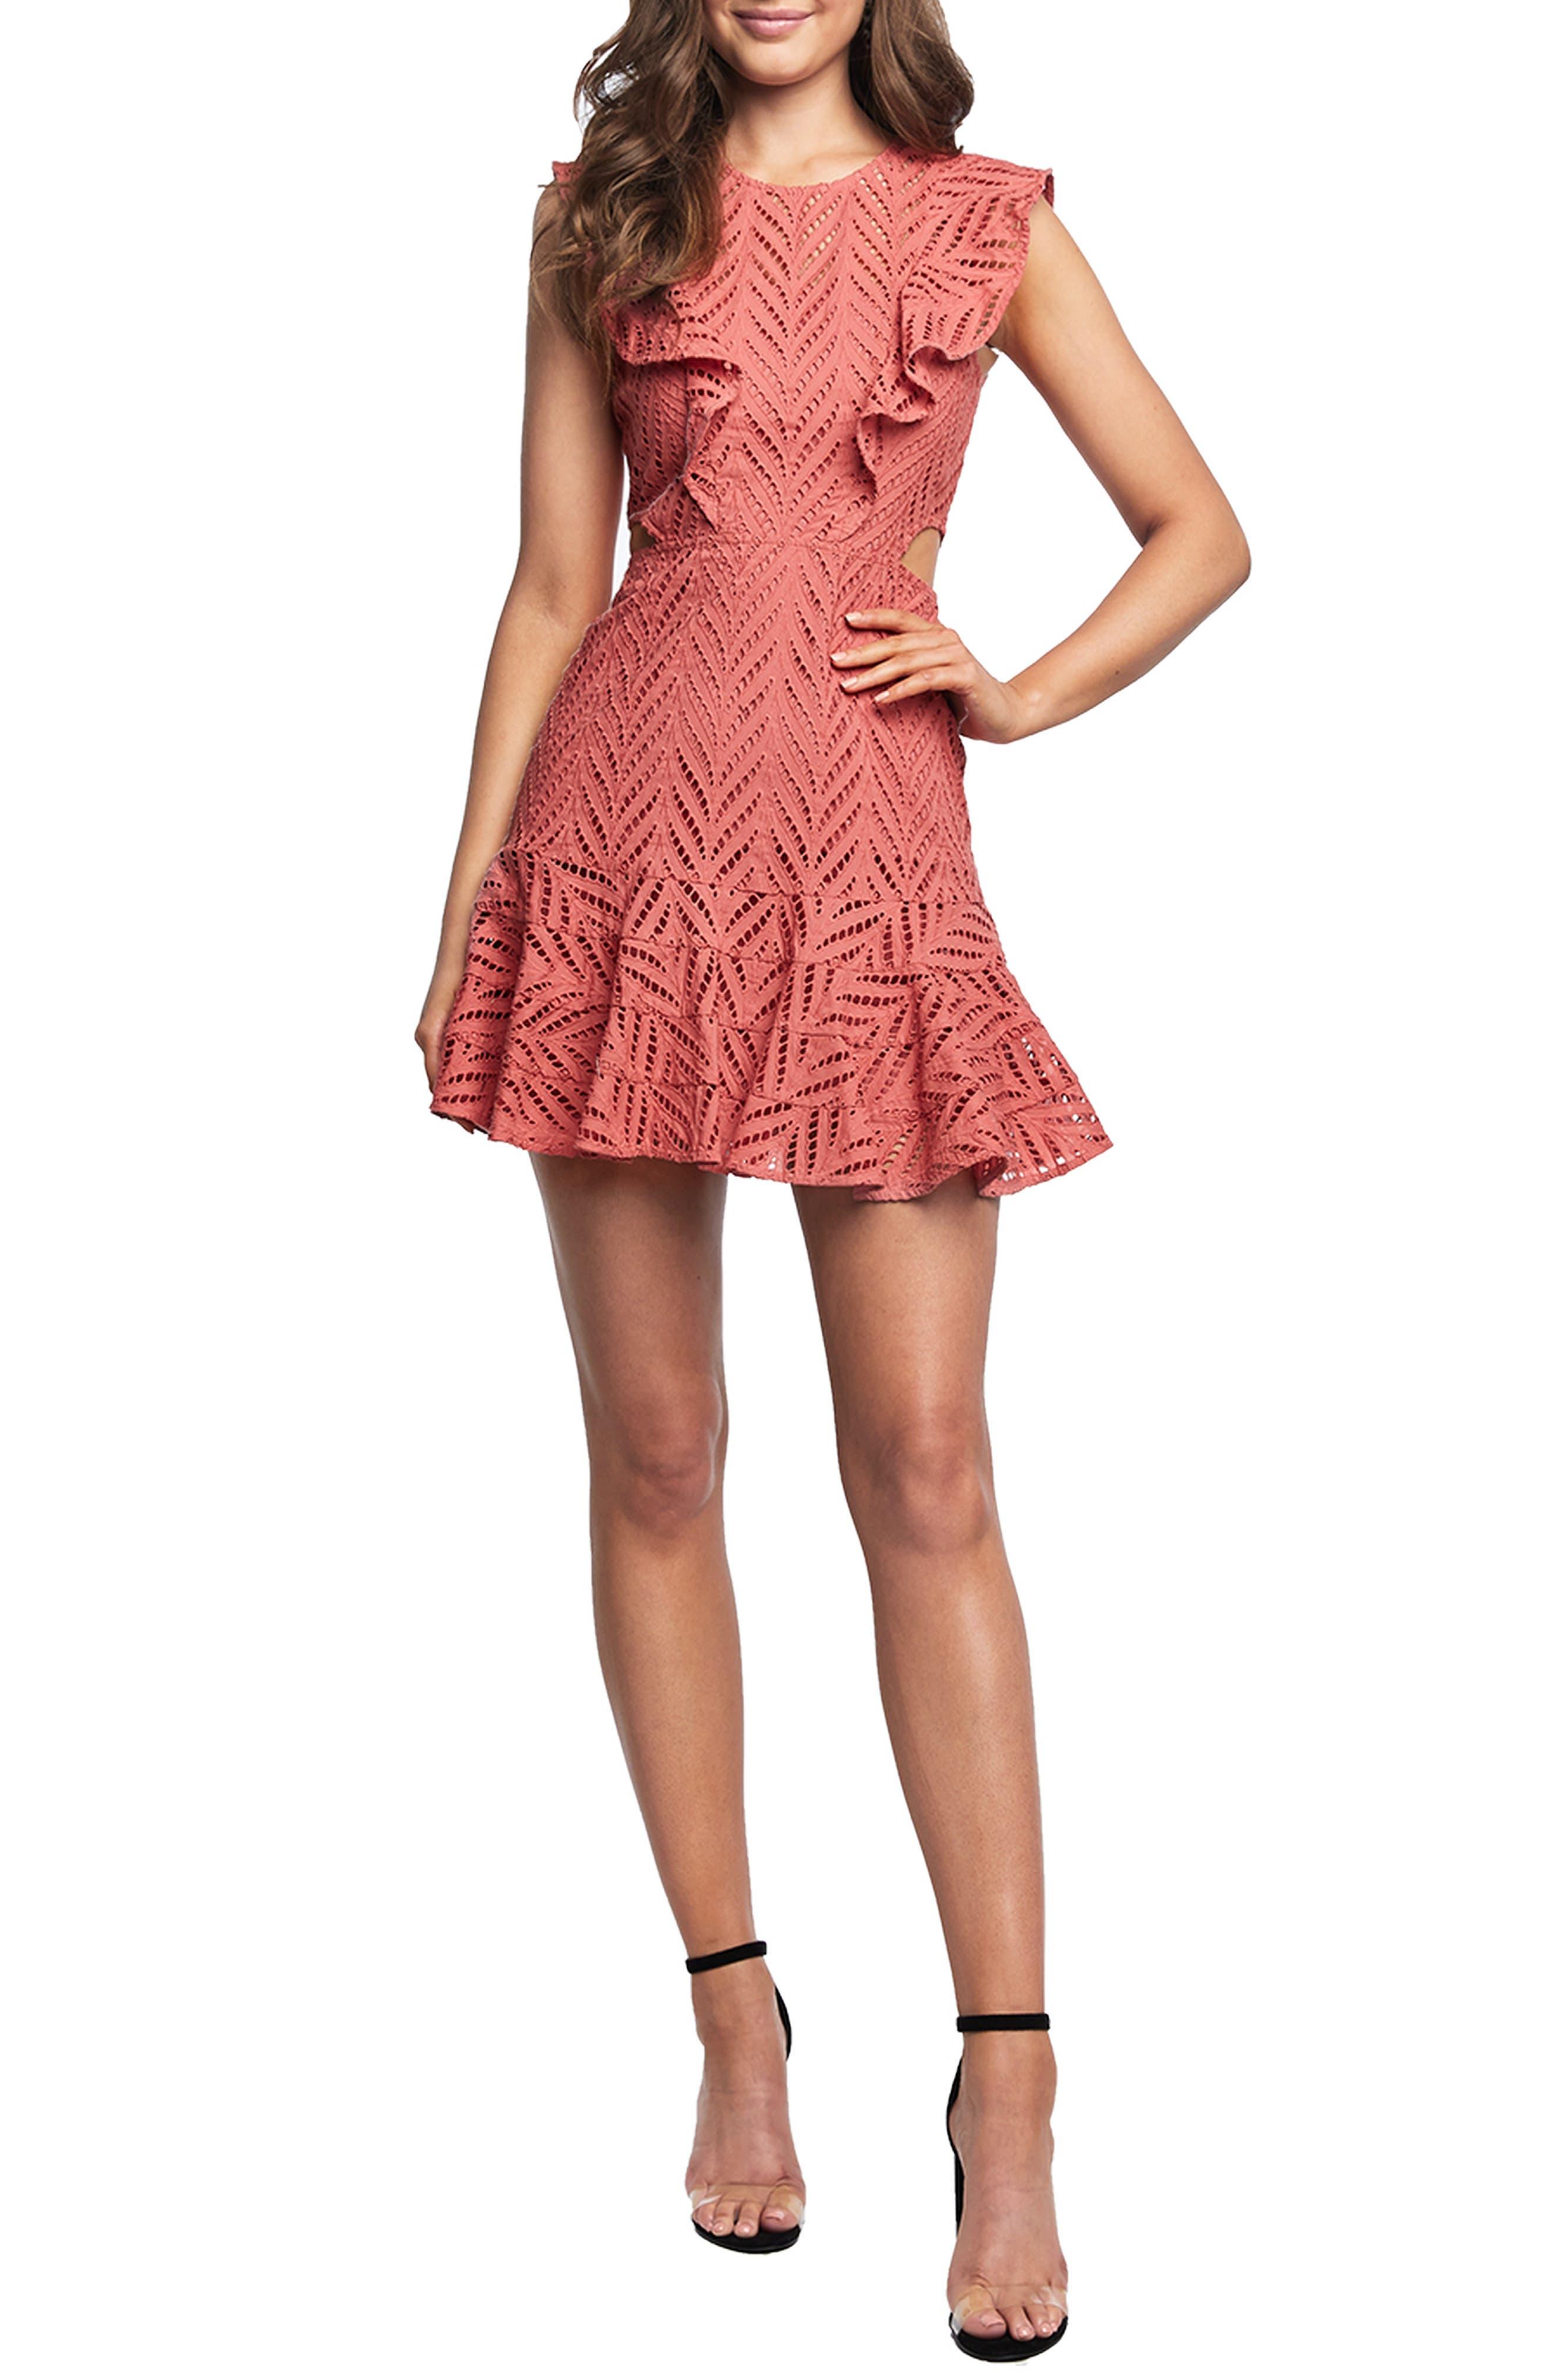 96a13173d8 Women's Bardot Dresses | Nordstrom